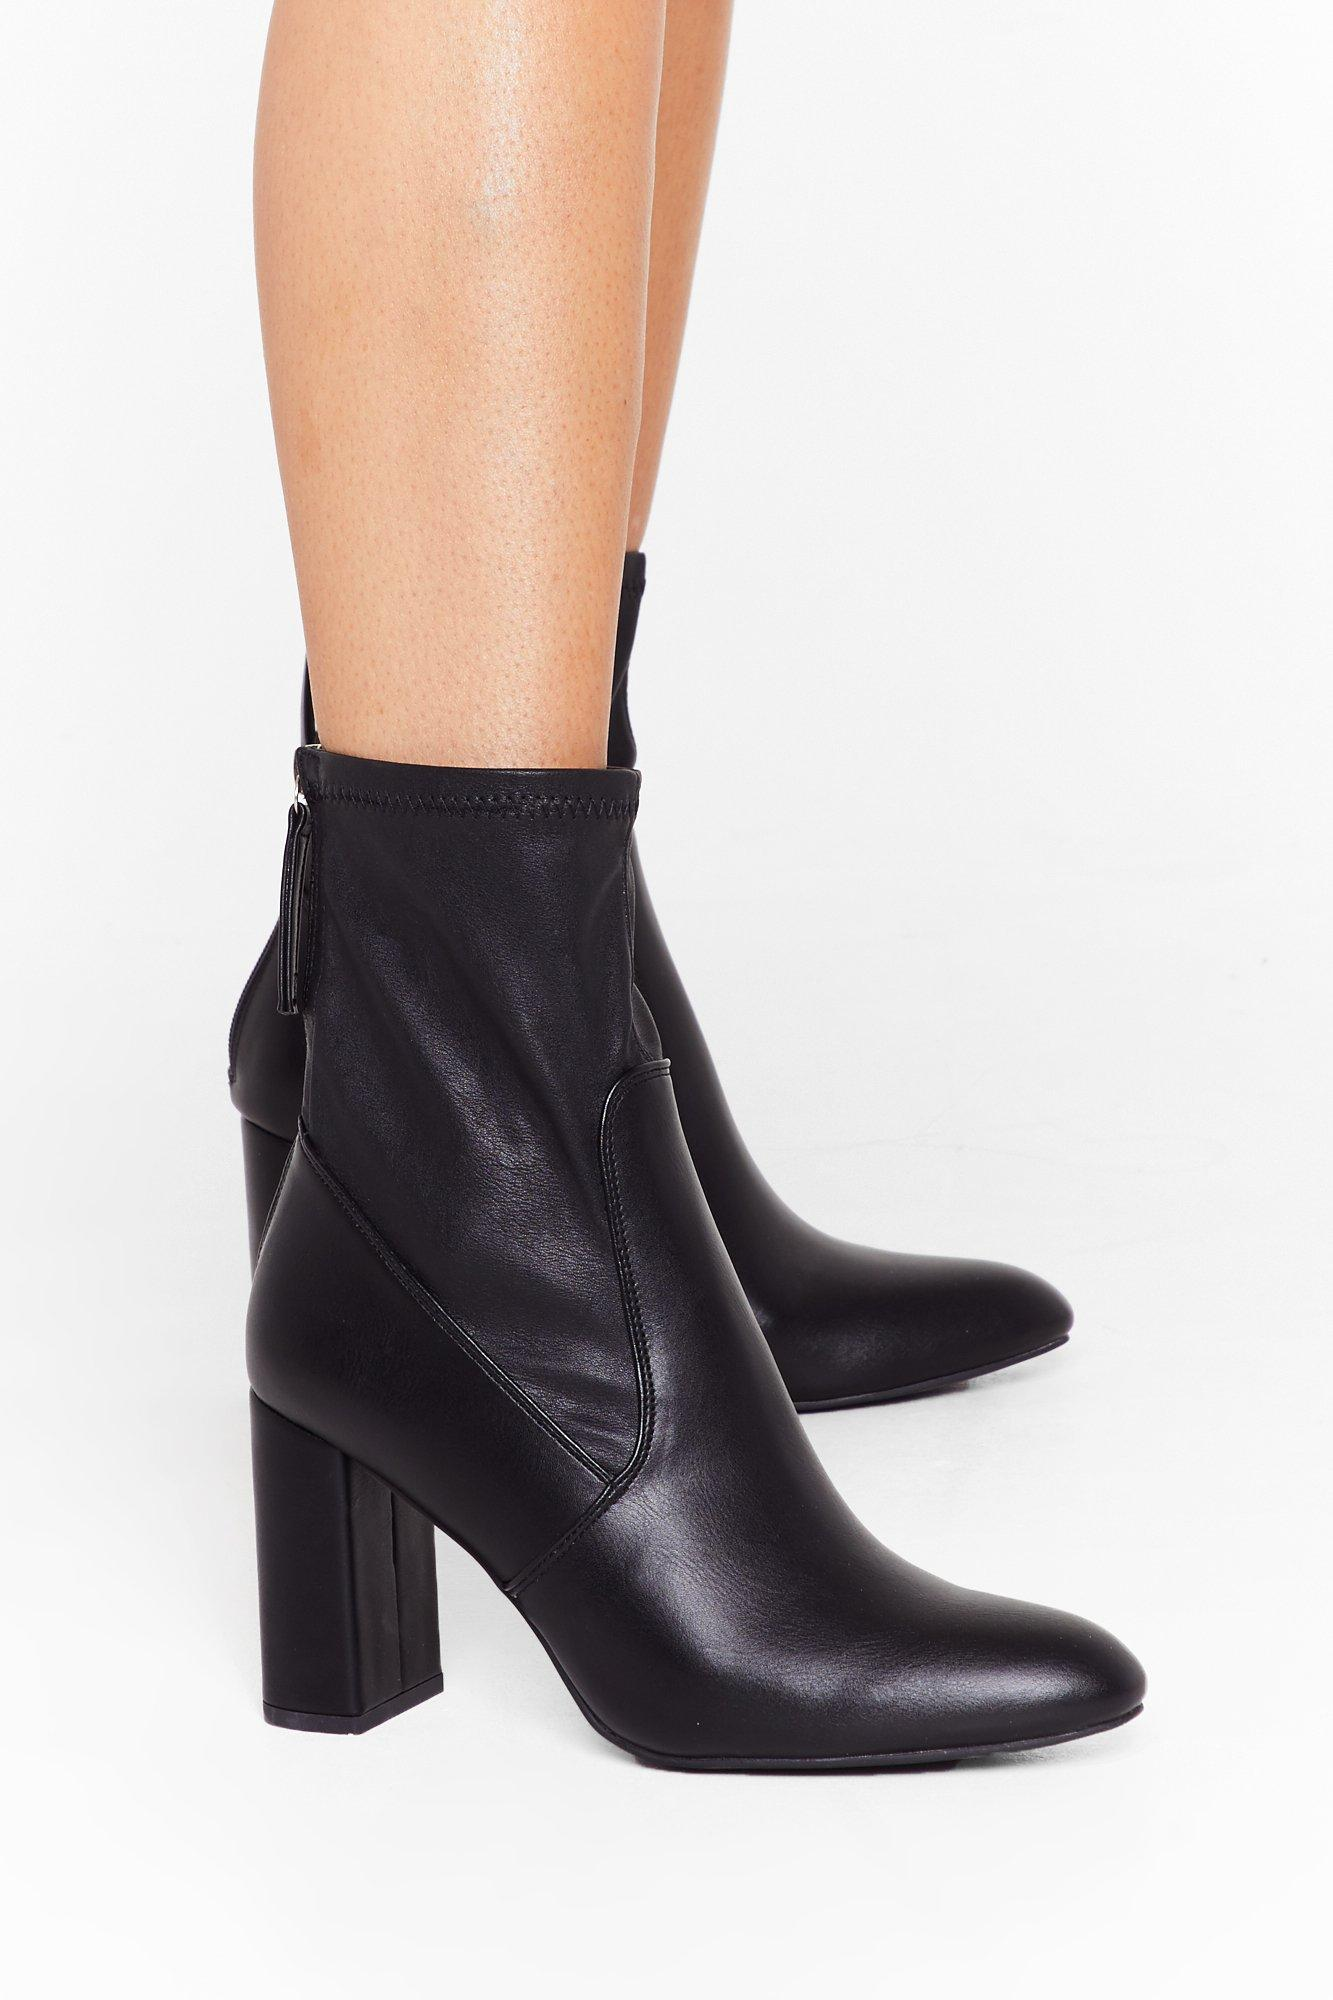 Image of Sock 'Em Dead Faux Leather Block Heel Boots